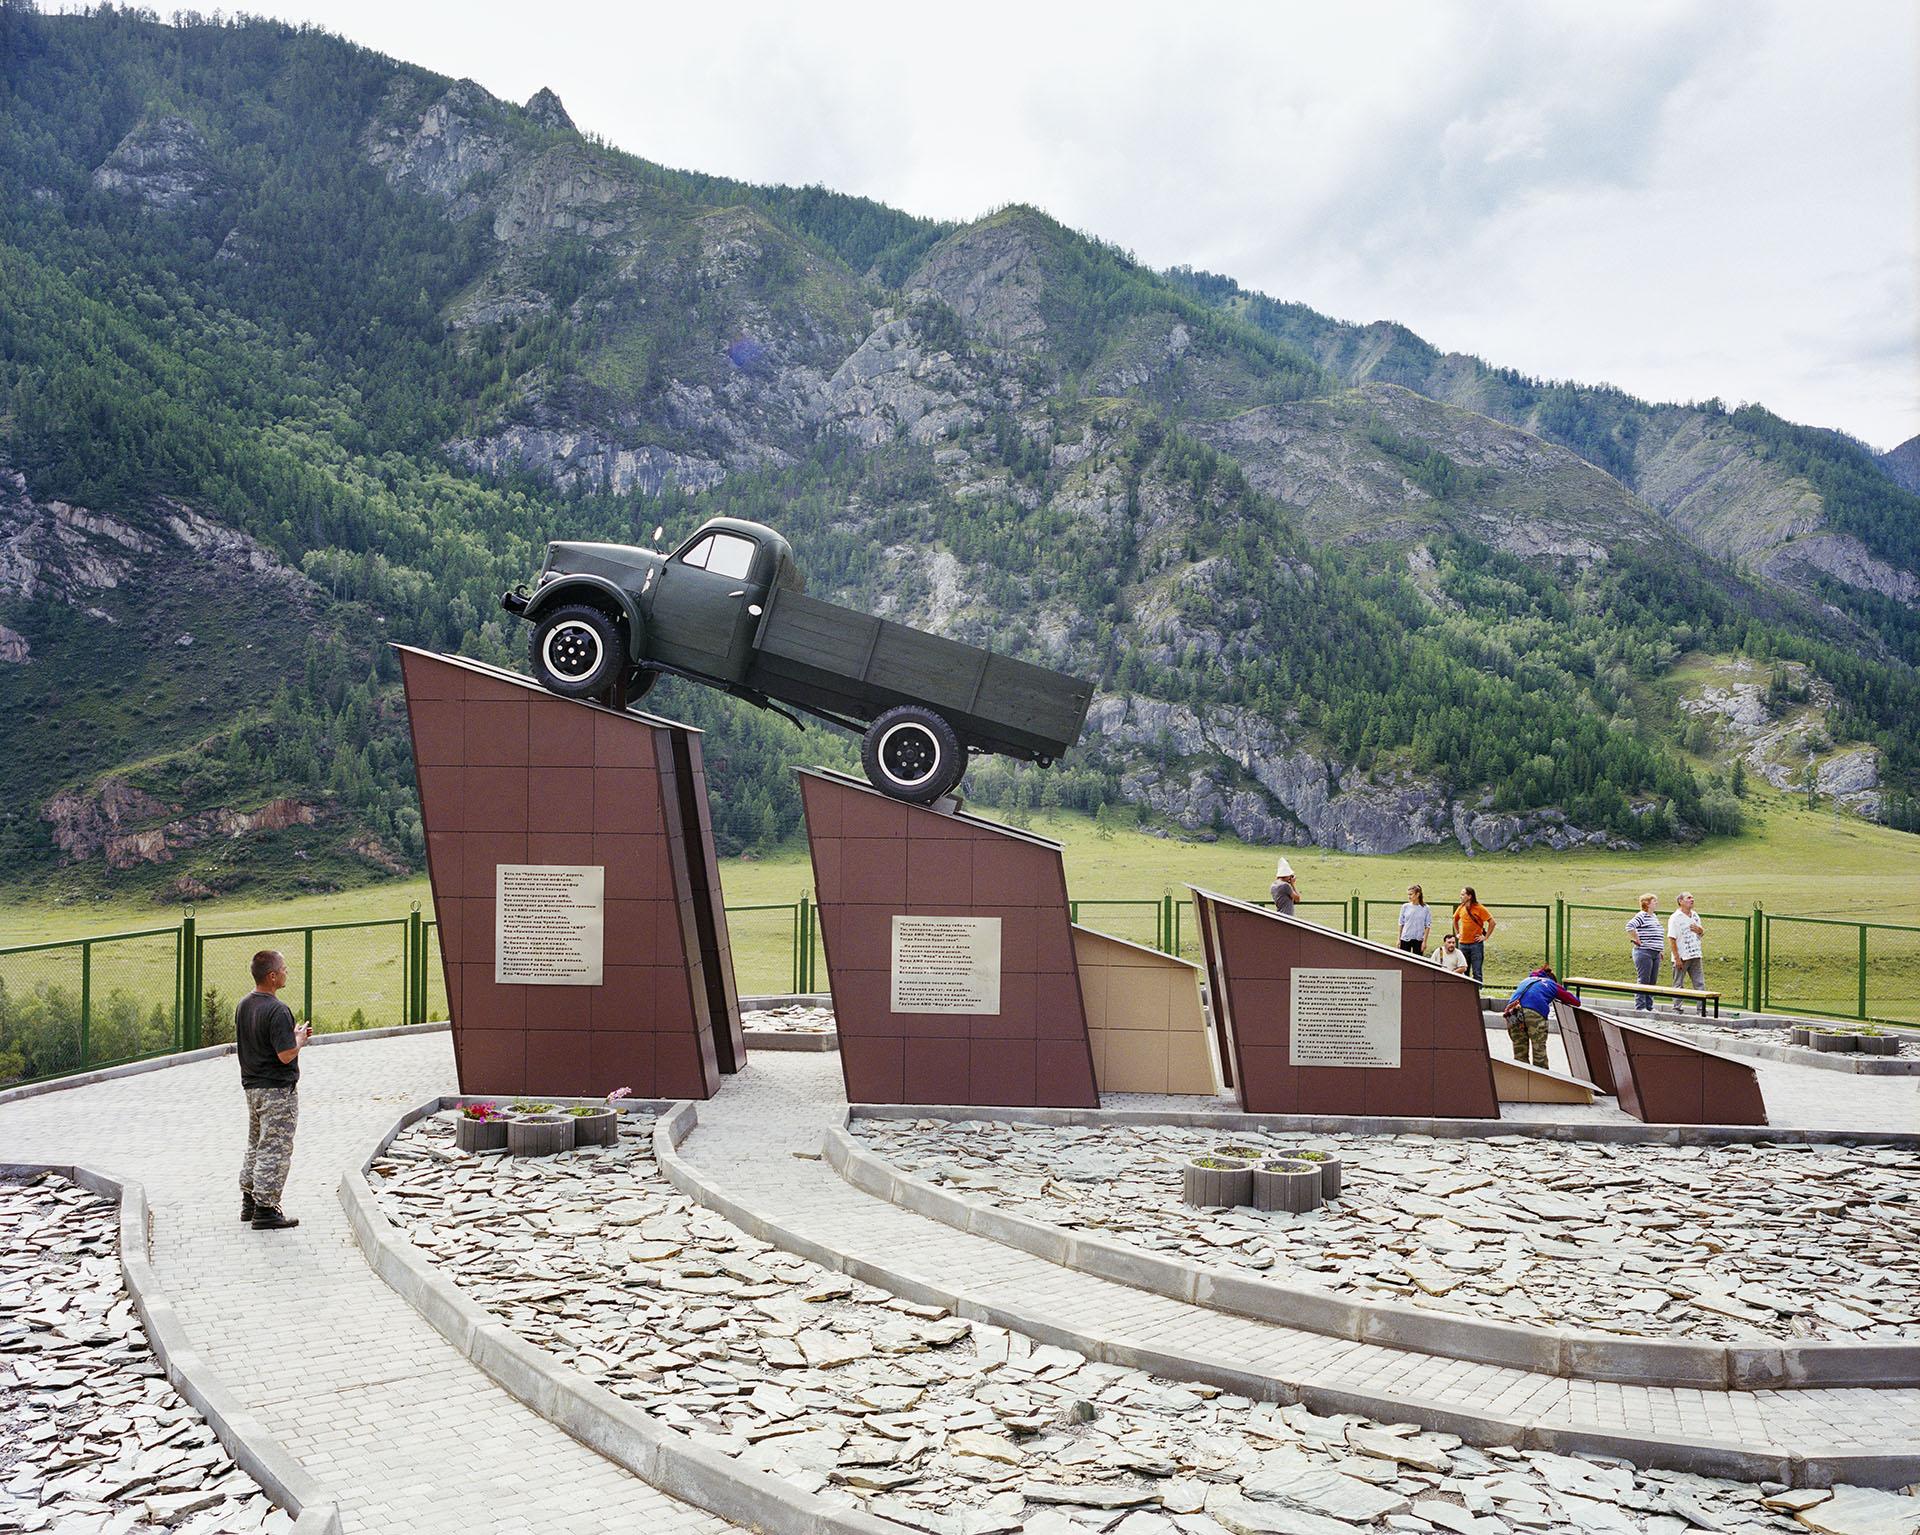 The Monument for Kolka Snegiriov, Chuysky highway Altai, Russia 2013